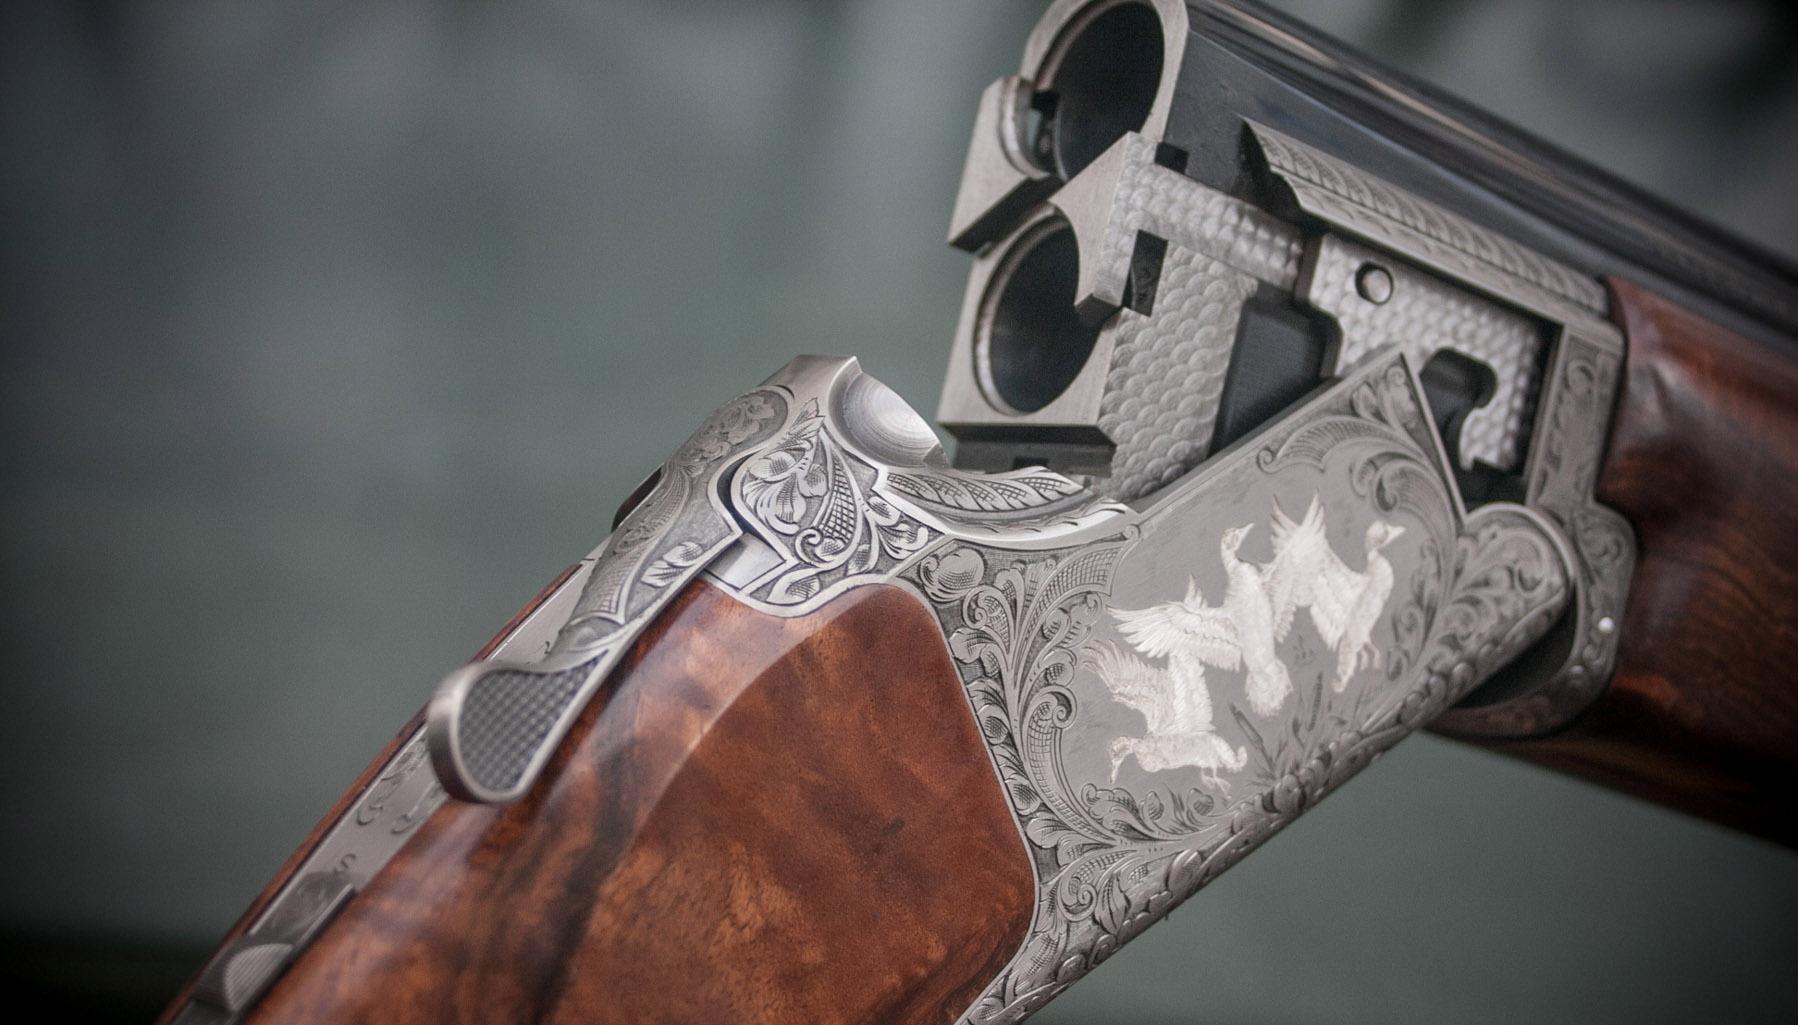 B525 The Crown Shotgun by Browning